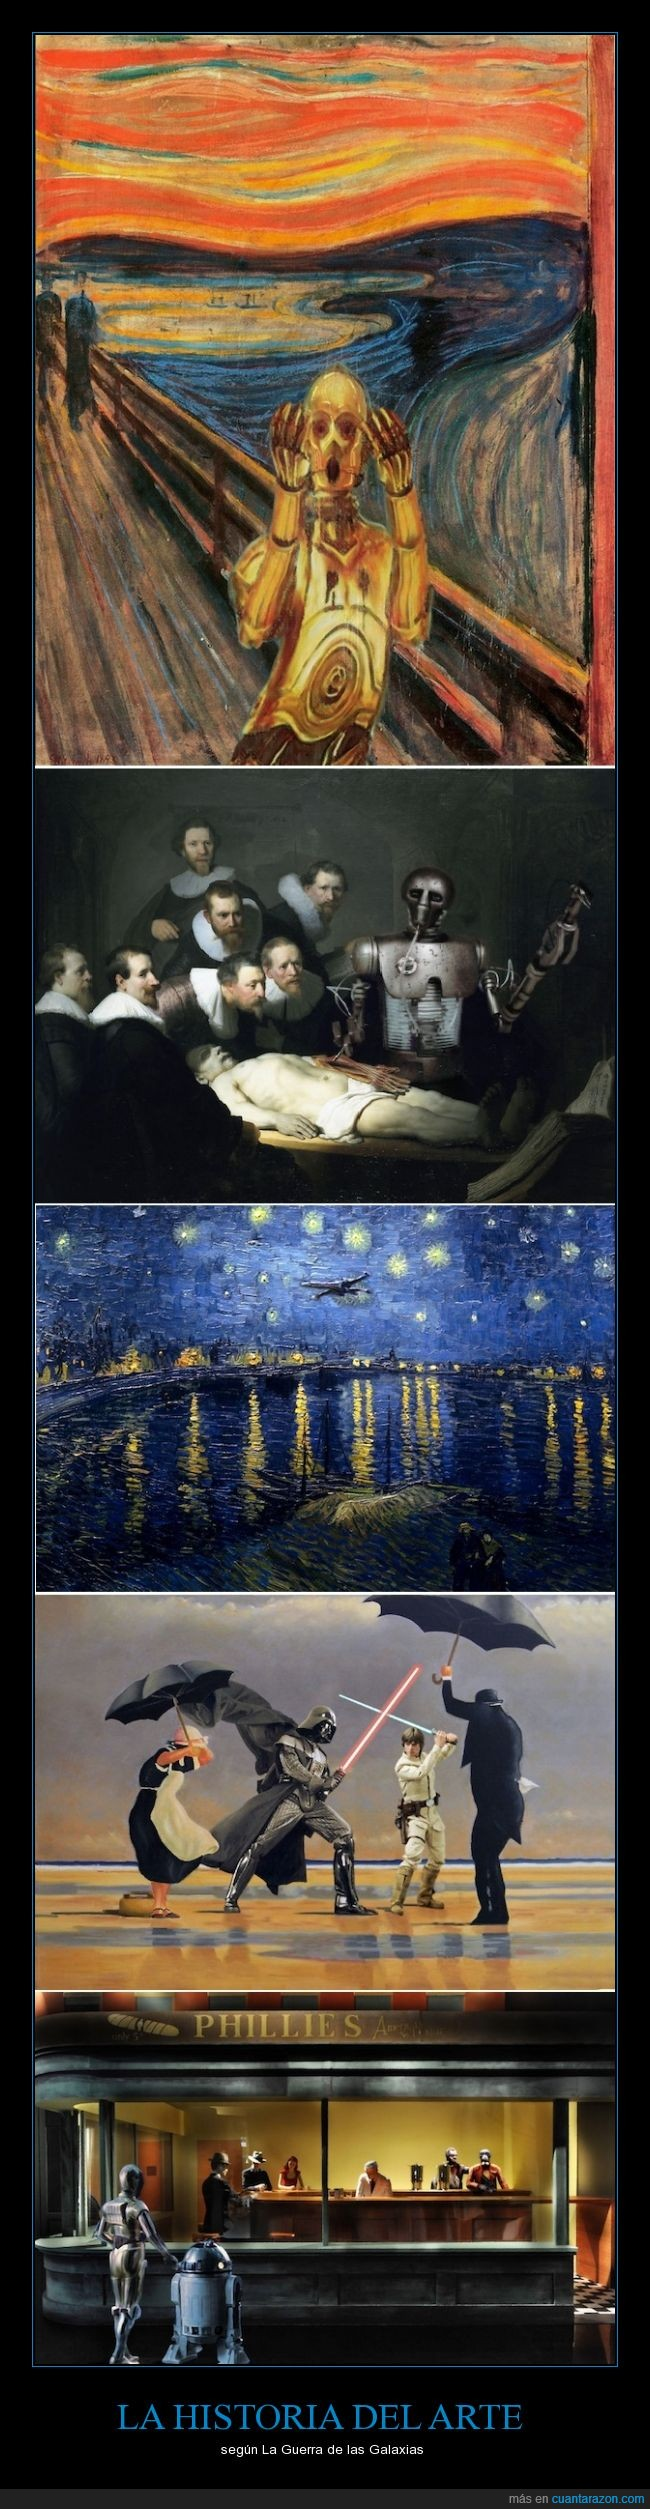 arte,cuadro,Hopper,mashup,Munch,Rembrandt,sar wars,Van Gogh,Warho,Wintersixfour